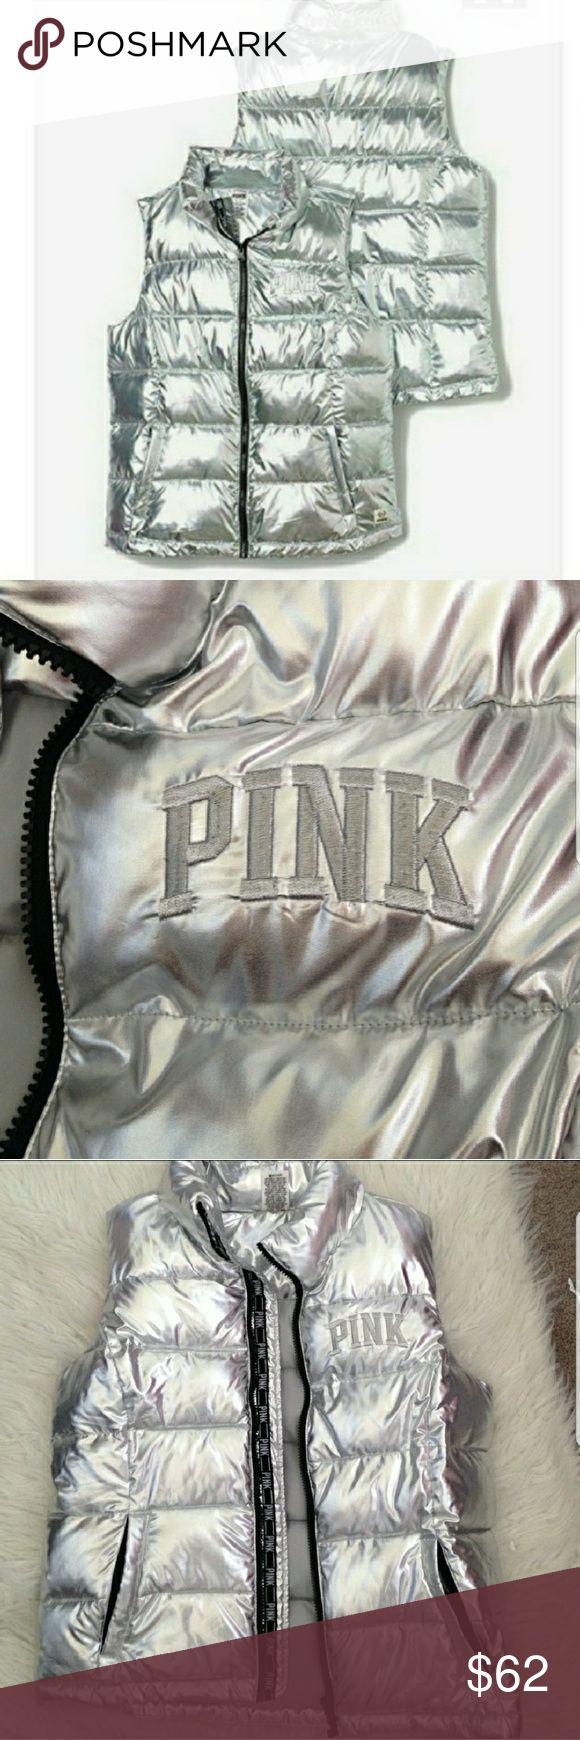 PINK VICTORIA'S SECRET SILVER VEST NWOT PINK VICTORIA'S SECRET THIS SILVER VEST IS FROM THE FASHION SHOW. NWOT PINK ON FRONT AND ON BACK OF COLLAR. SIDE POCKETS. ZIP UP FRONT. A MUST HAVE PINK Victoria's Secret Jackets & Coats Vests